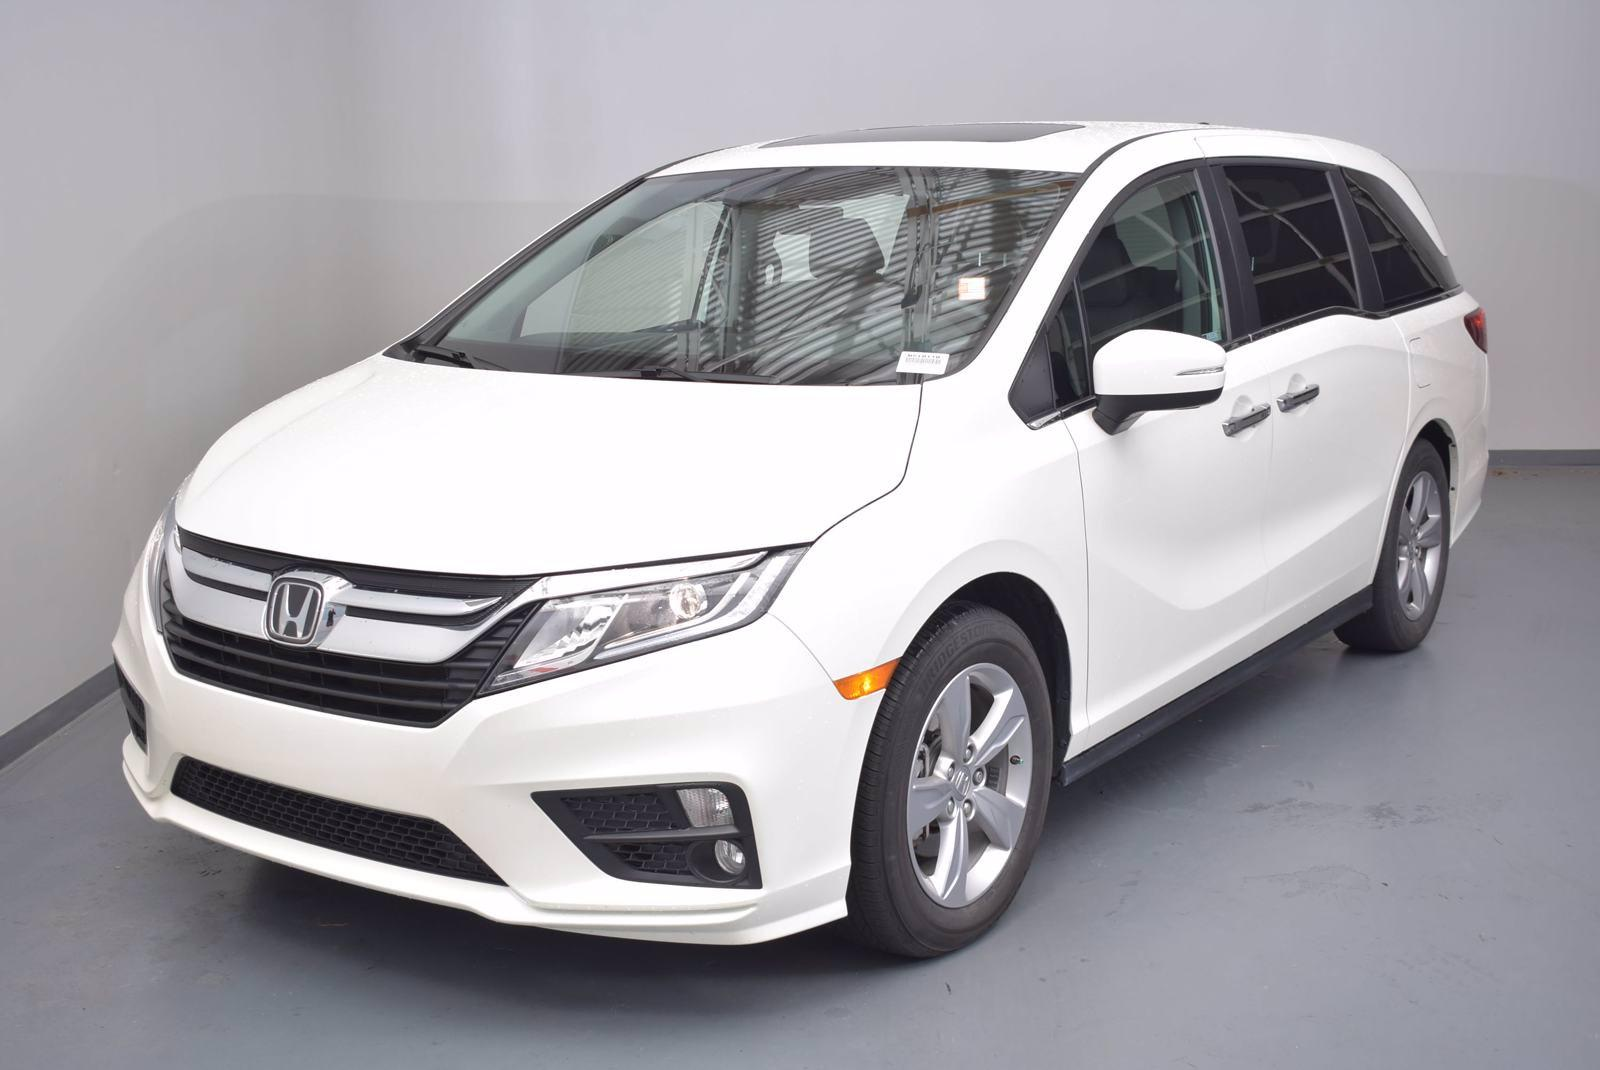 2019 Honda Odyssey Vehicle Photo in Cary, NC 27511